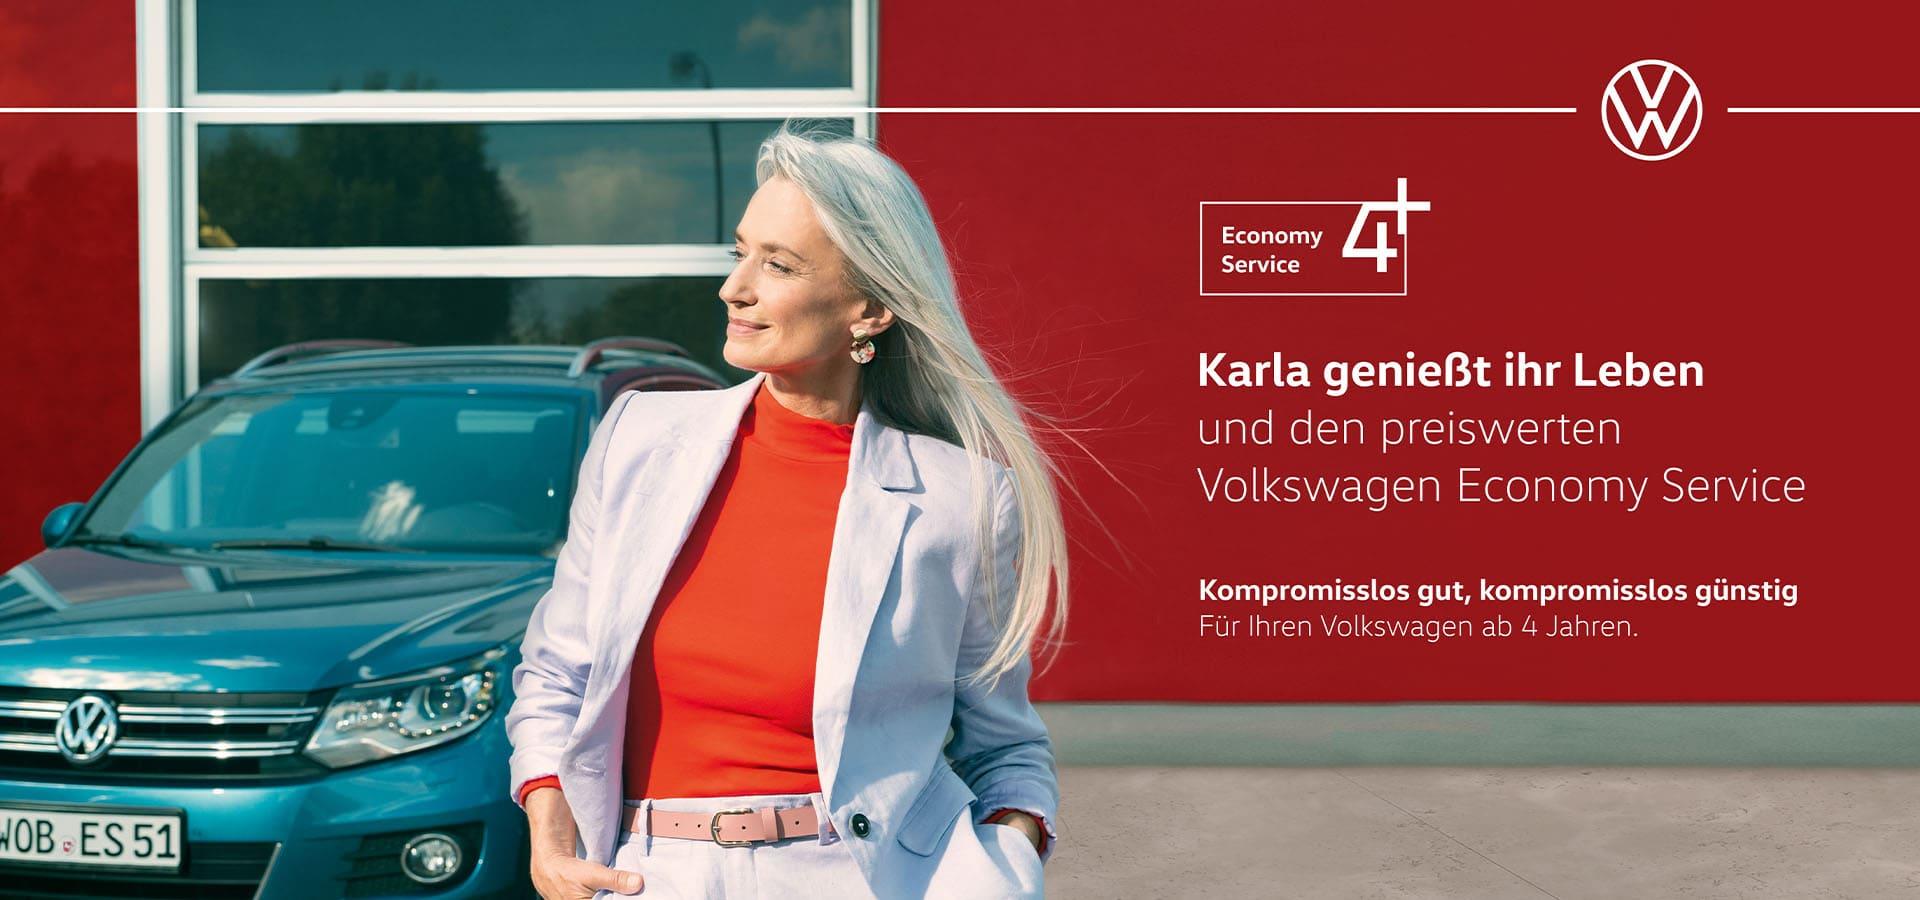 Volkswagen Economy Service 4+